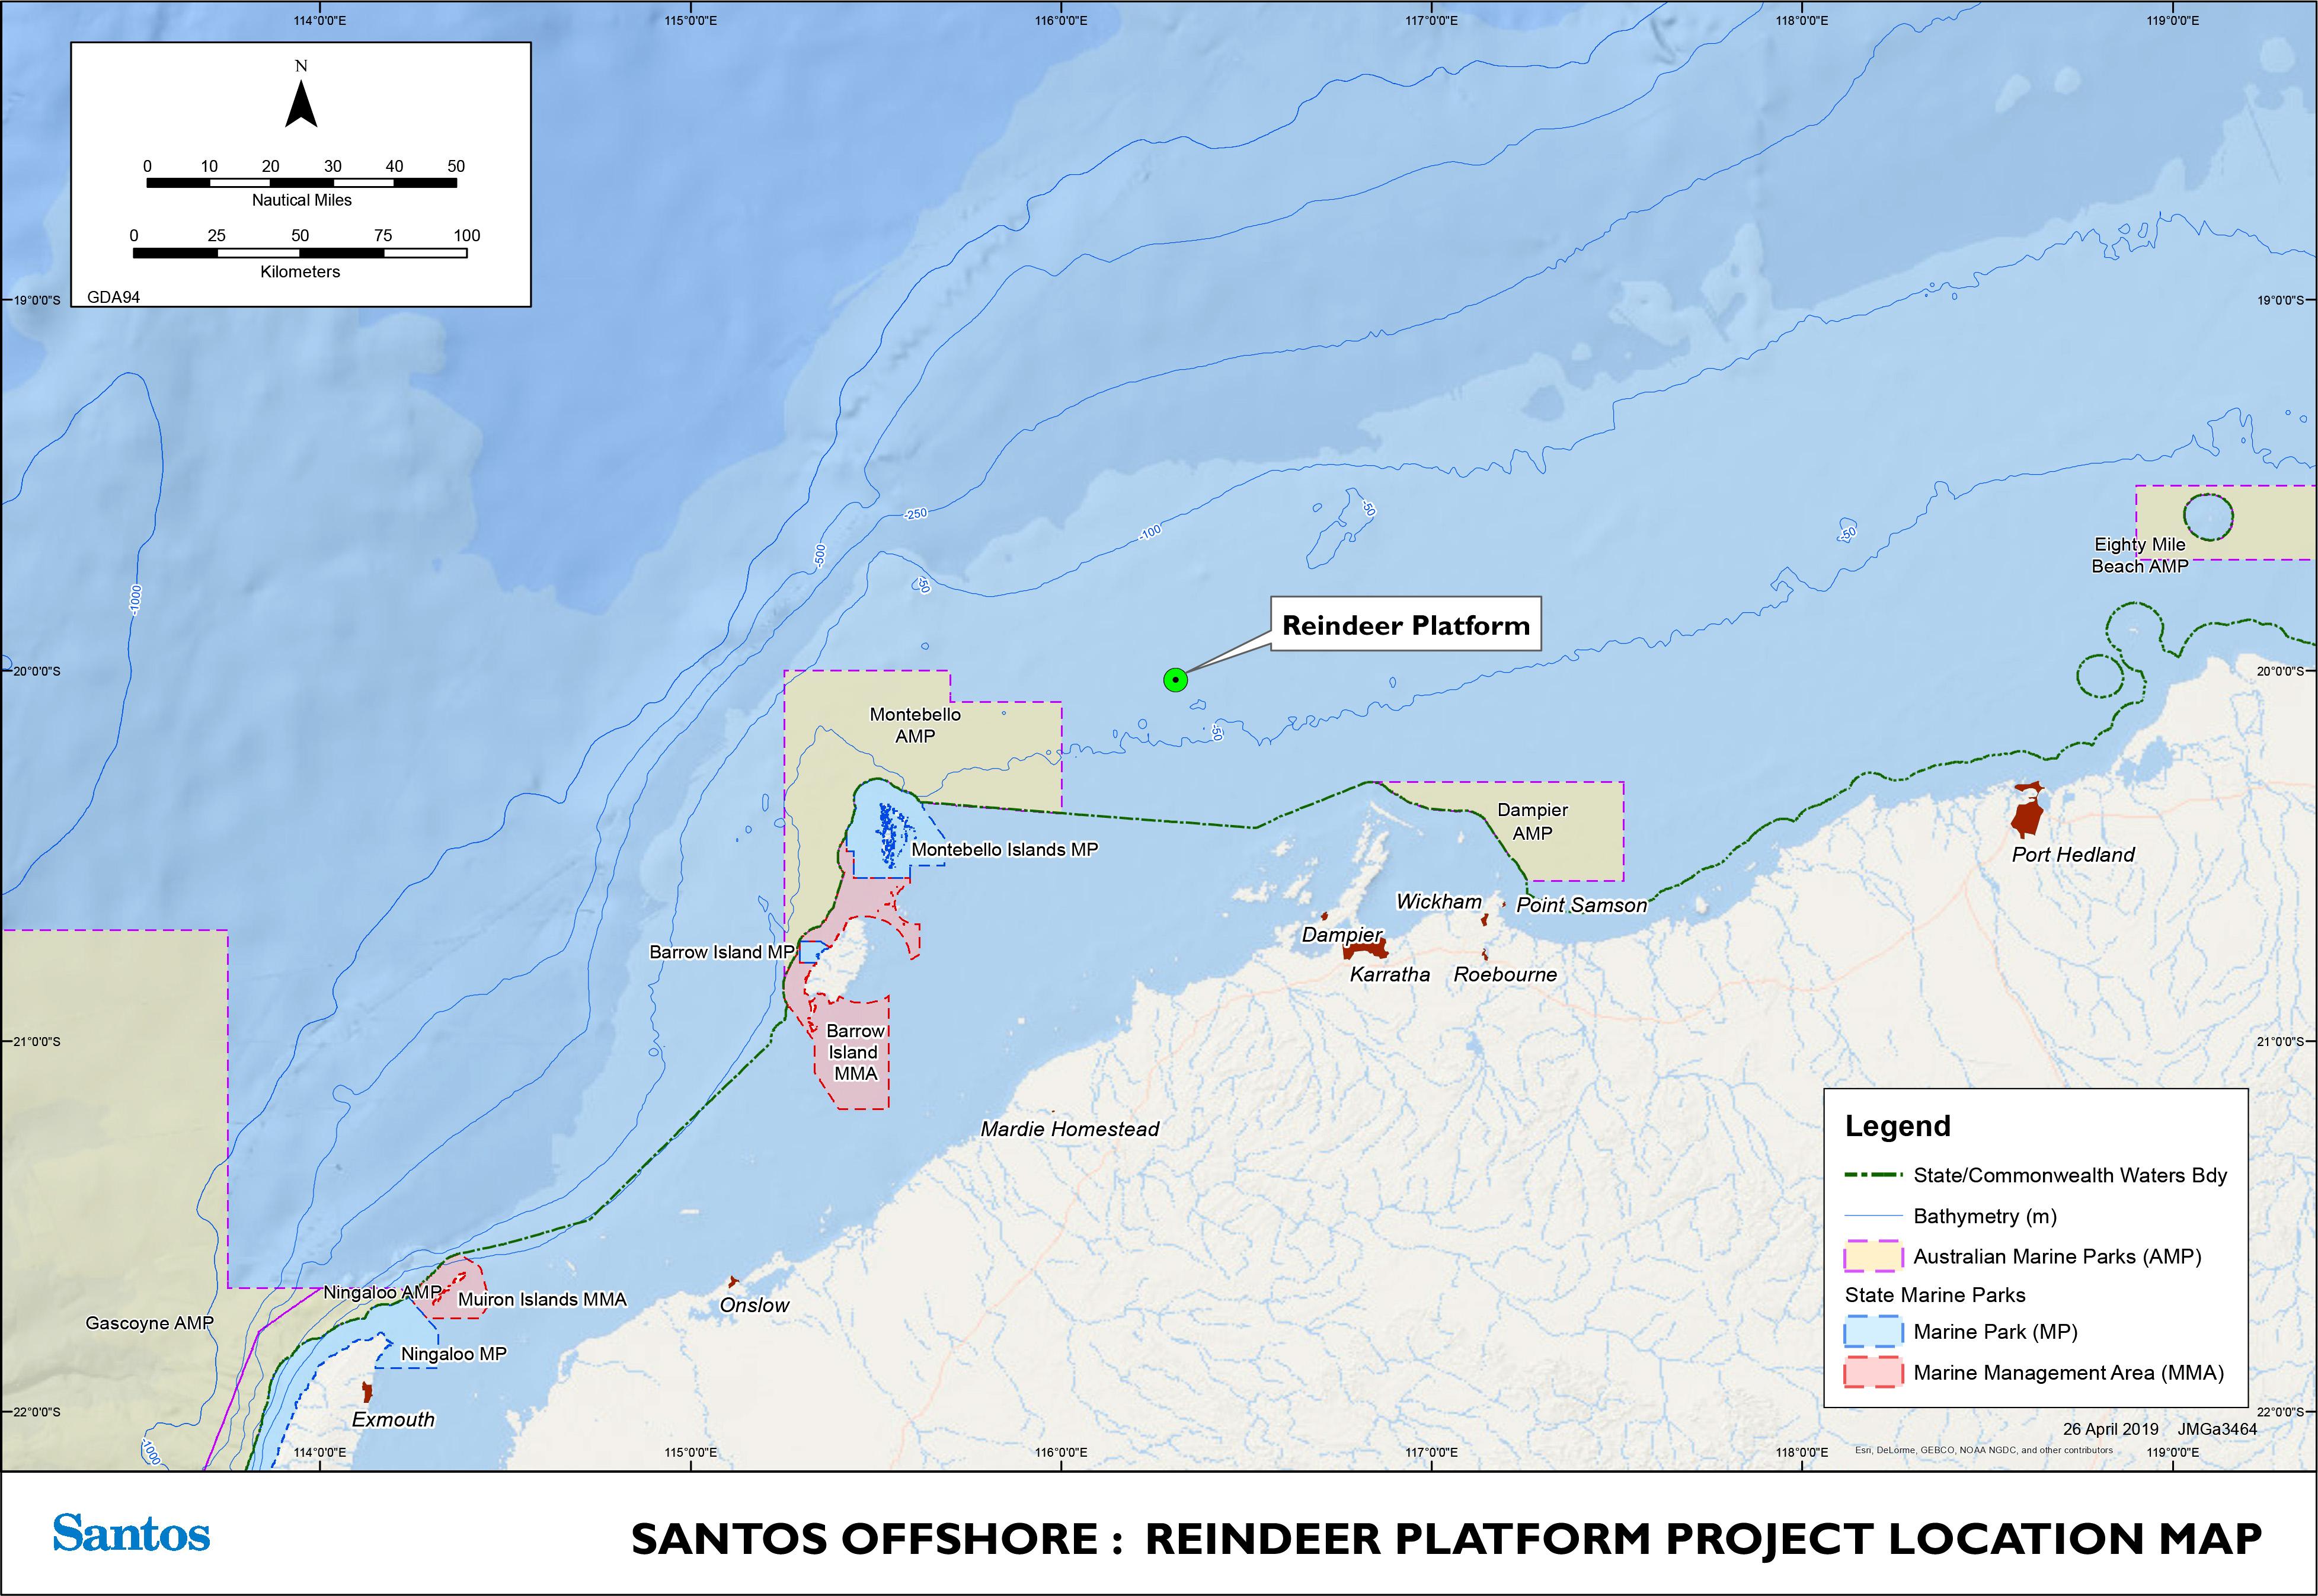 Project map - Reindeer Field Development (refer to Description)